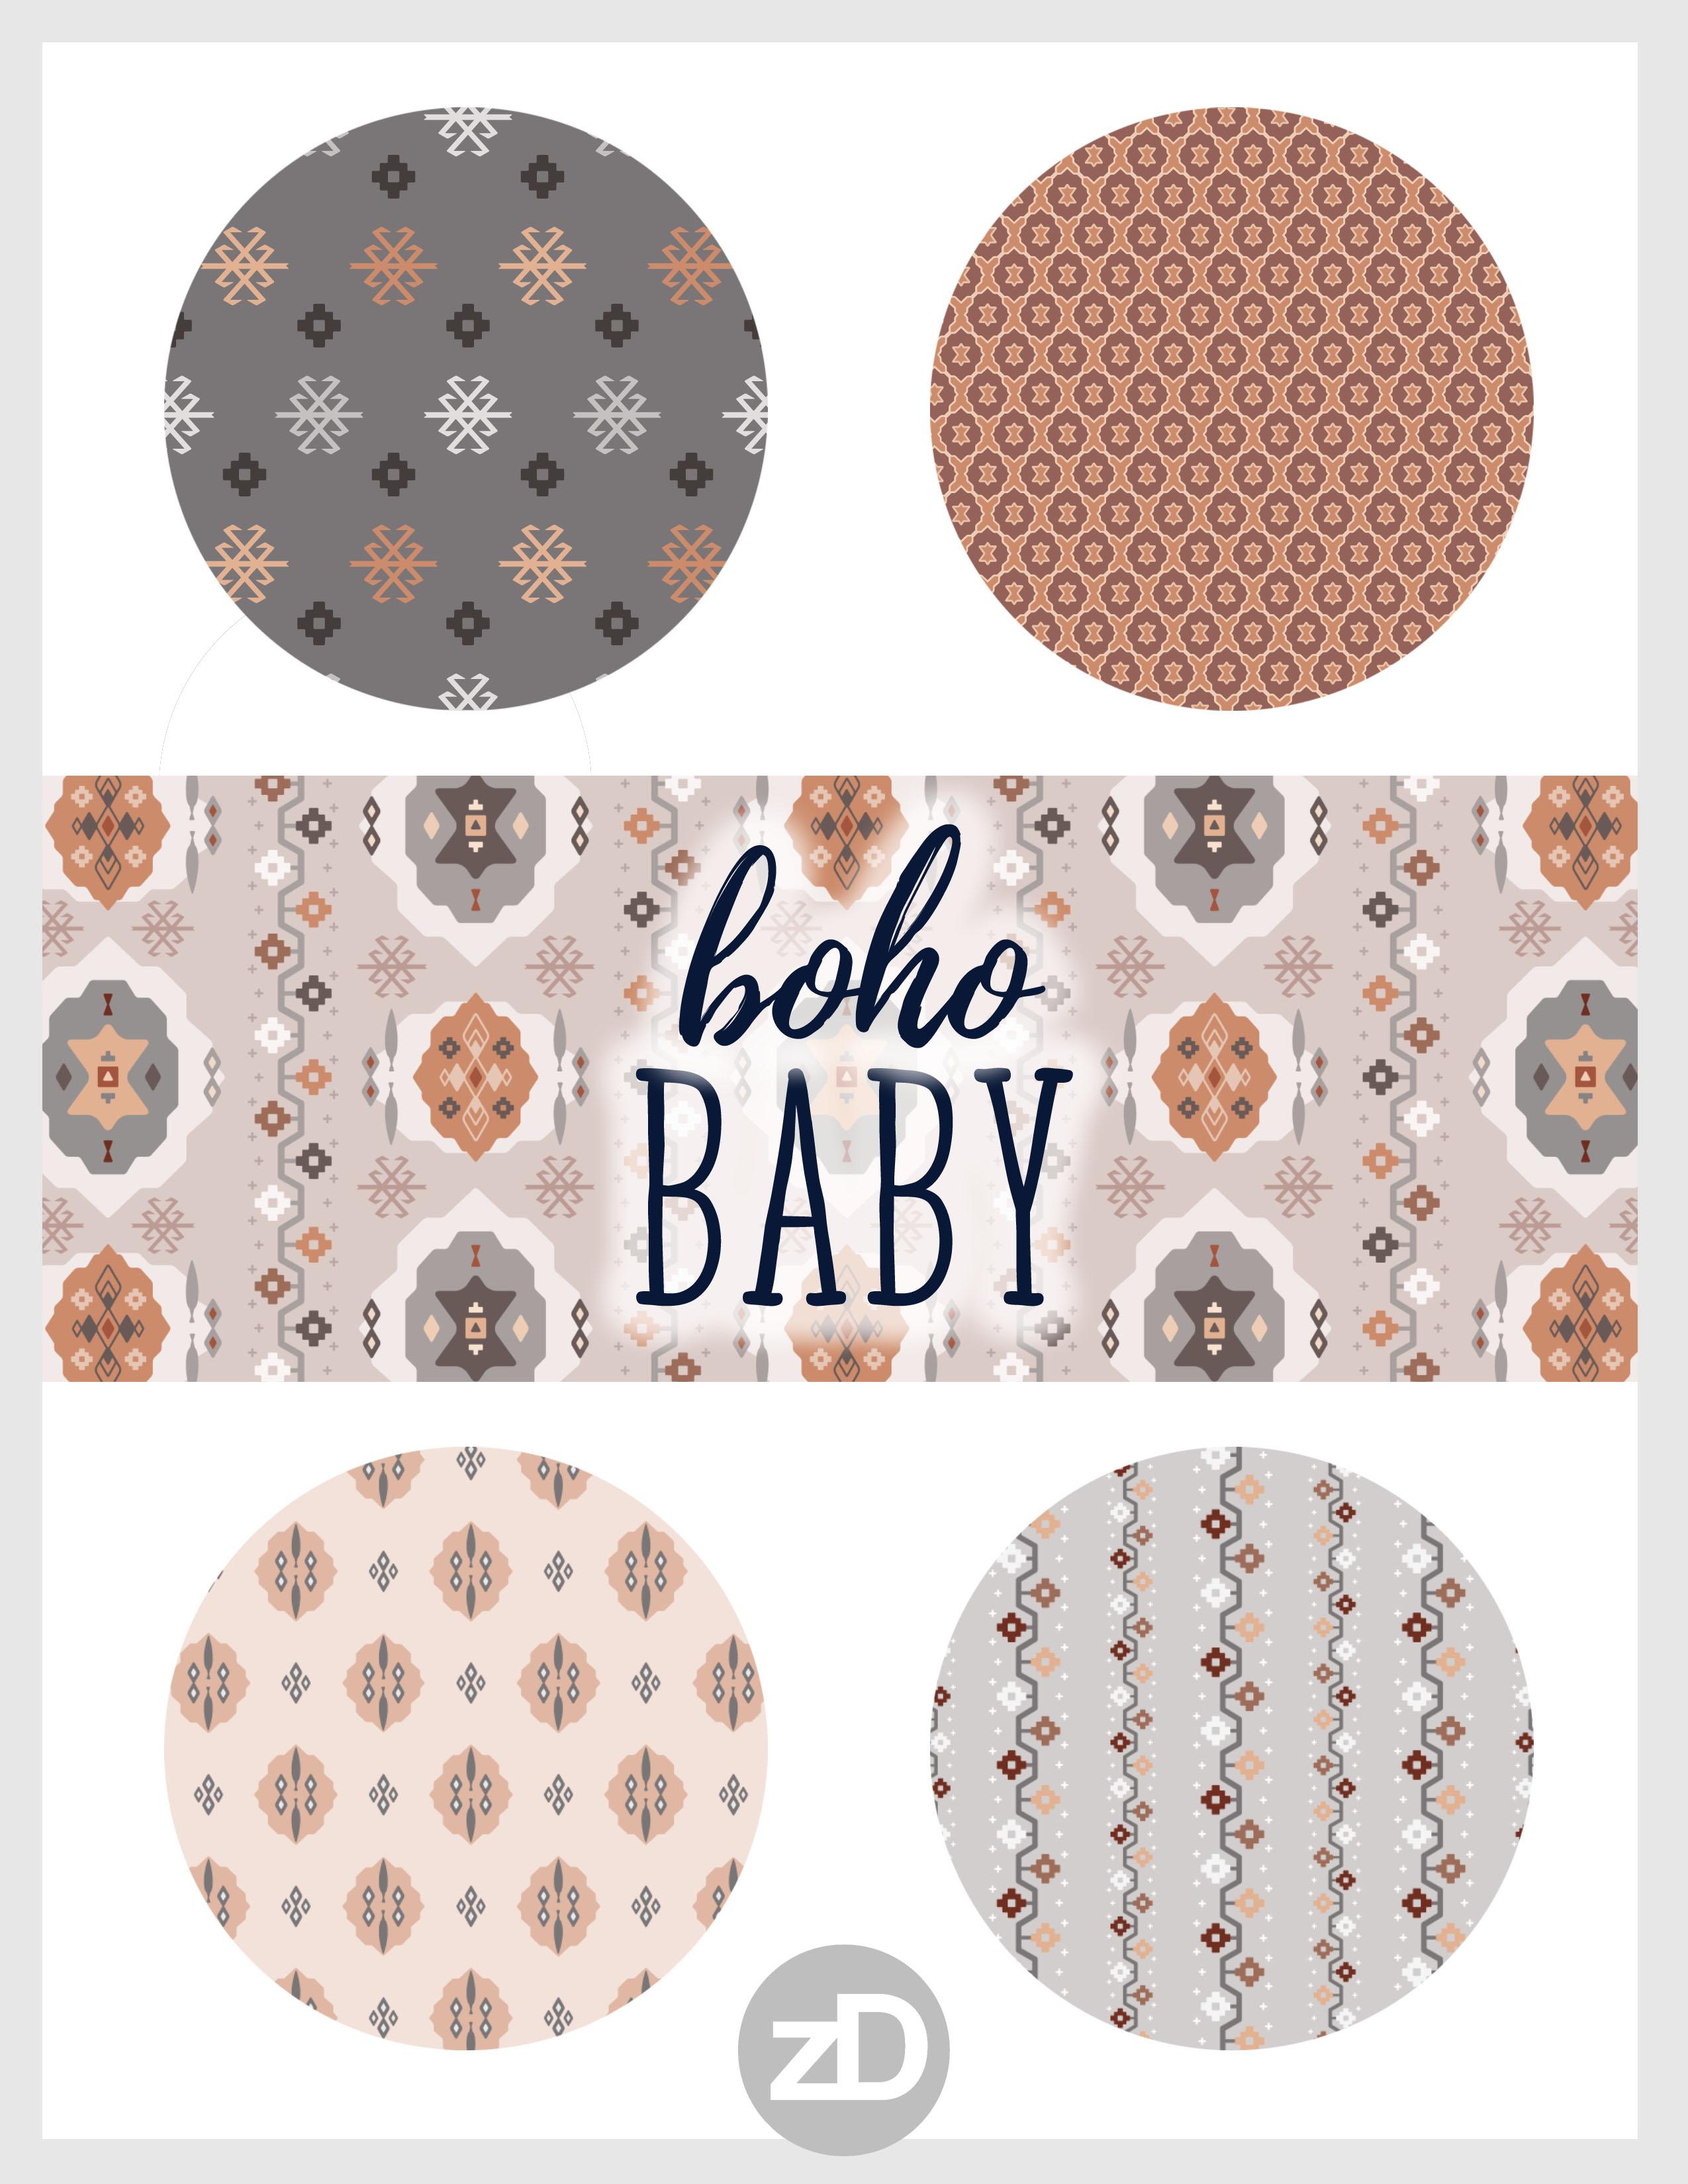 Baby Boho // Middle Eastern Metallic Turkish Kilim Pattern Collection